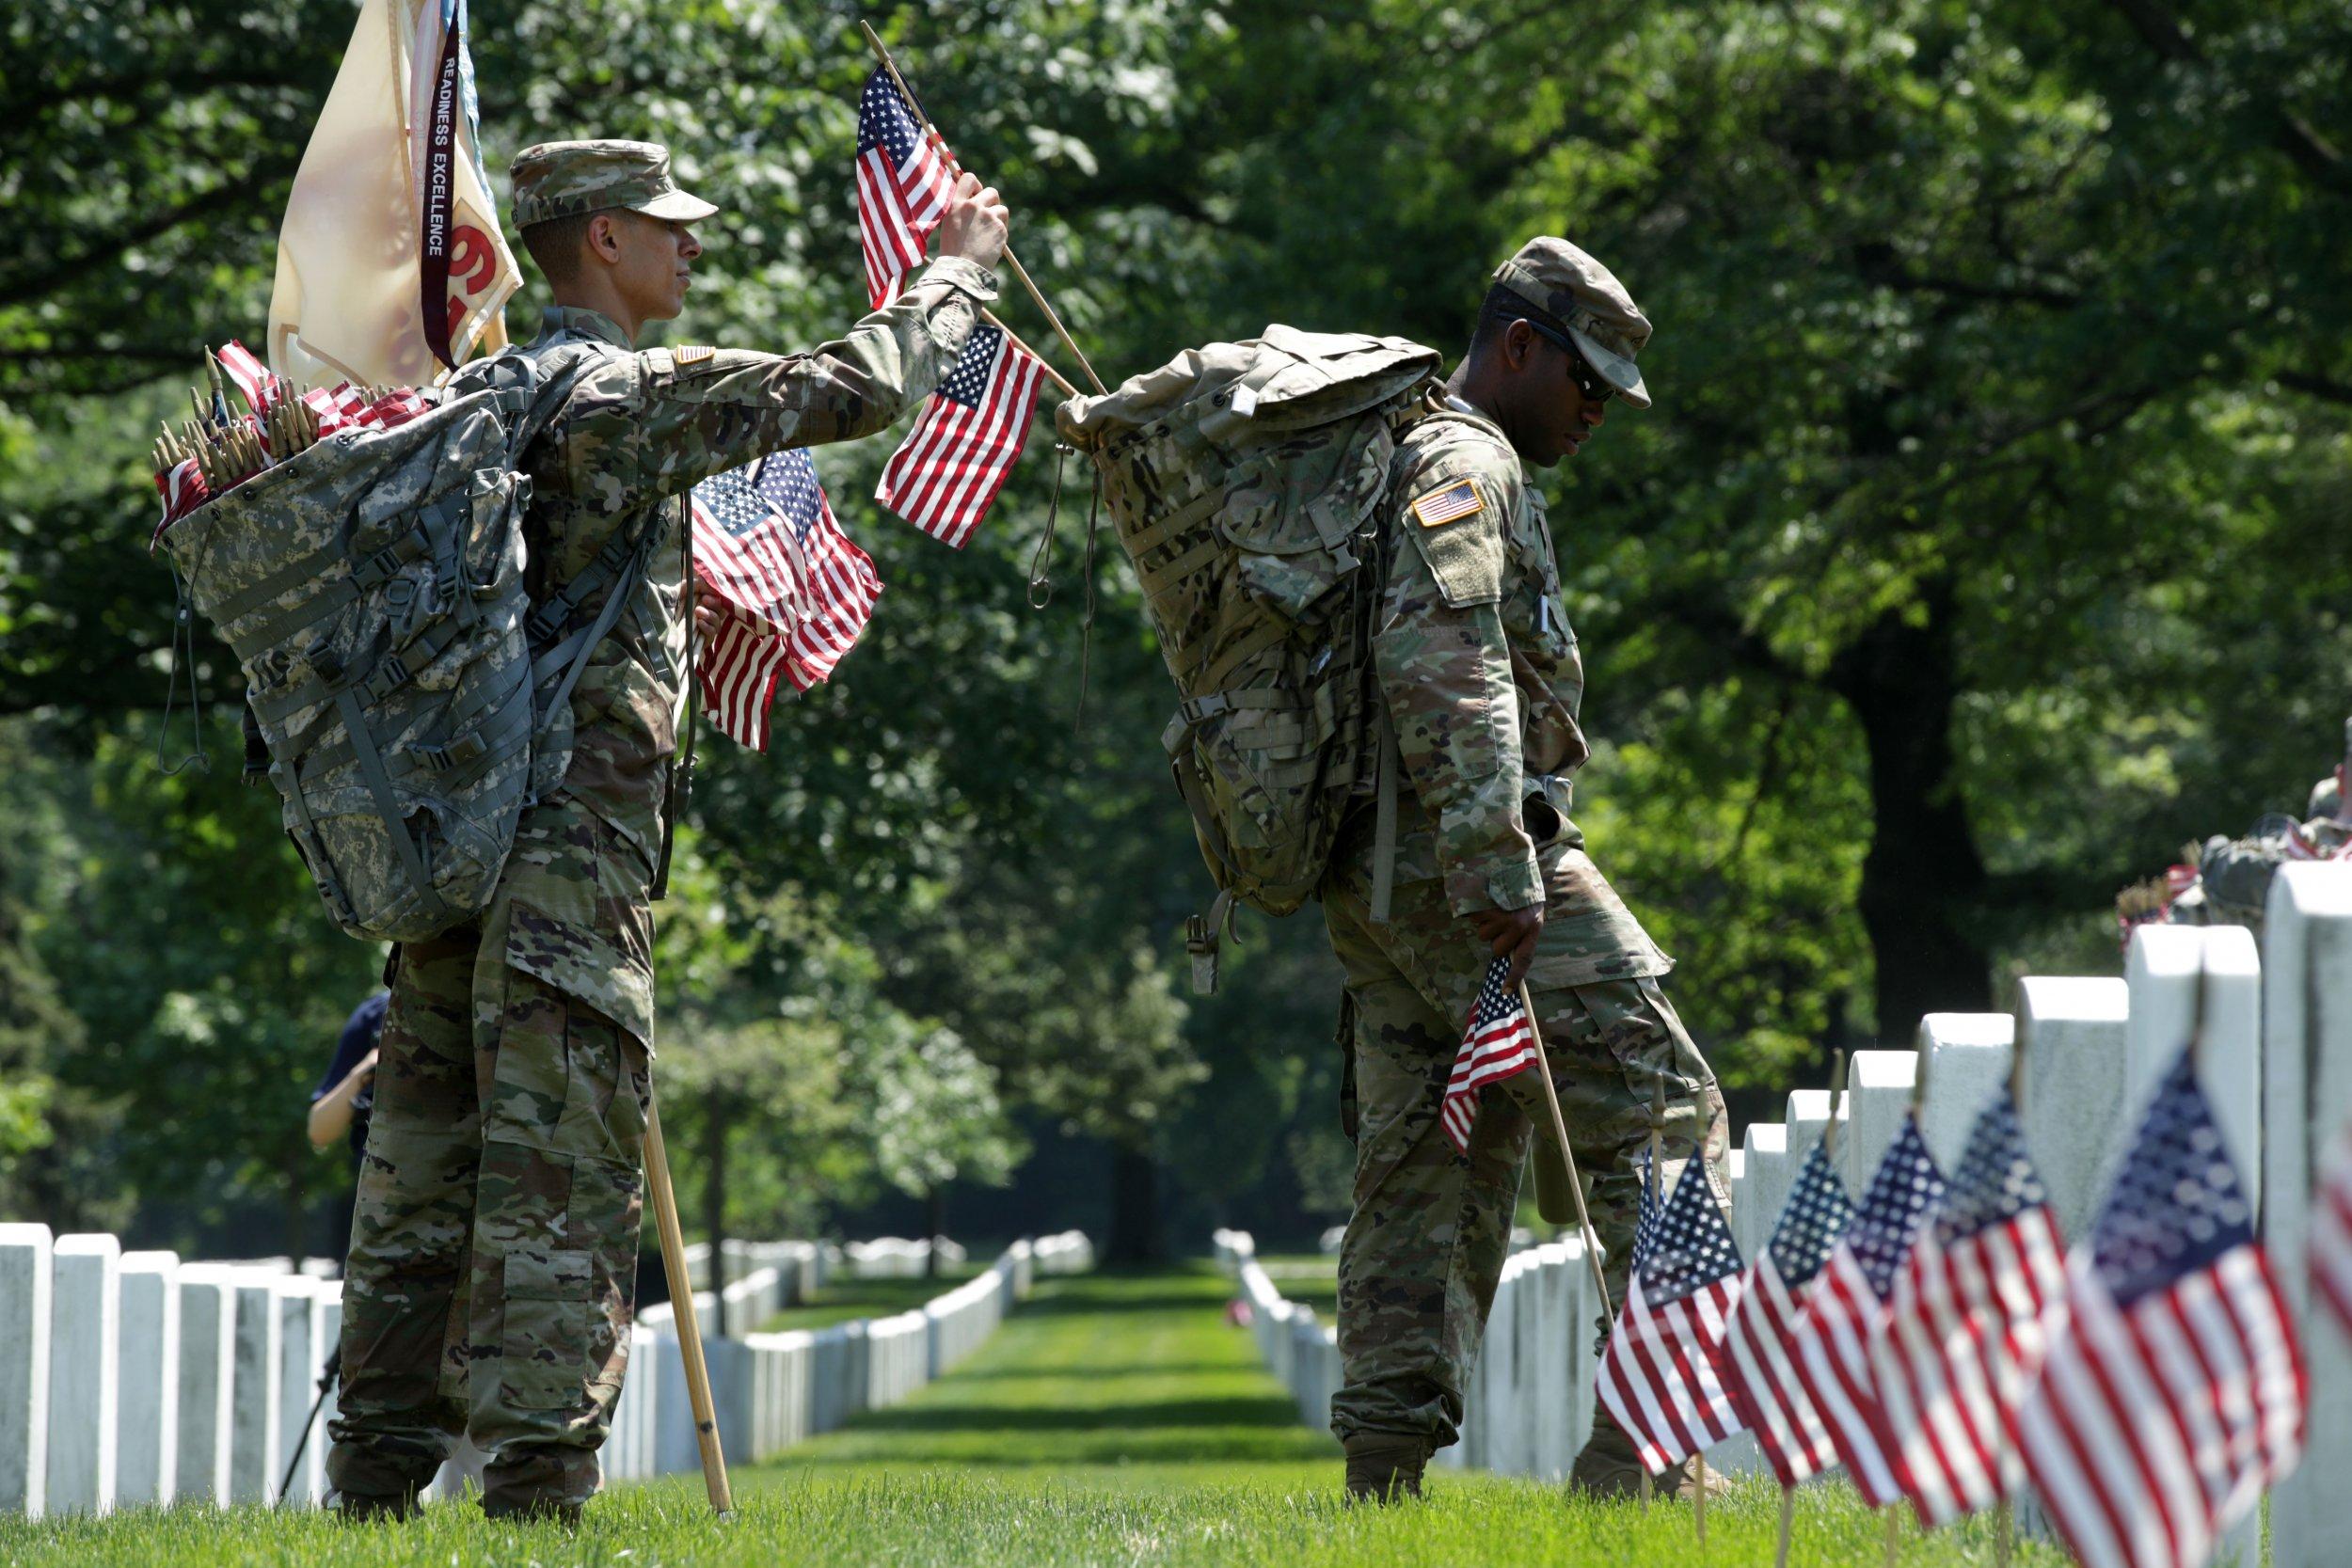 Arlington_soldiers_memorial_day